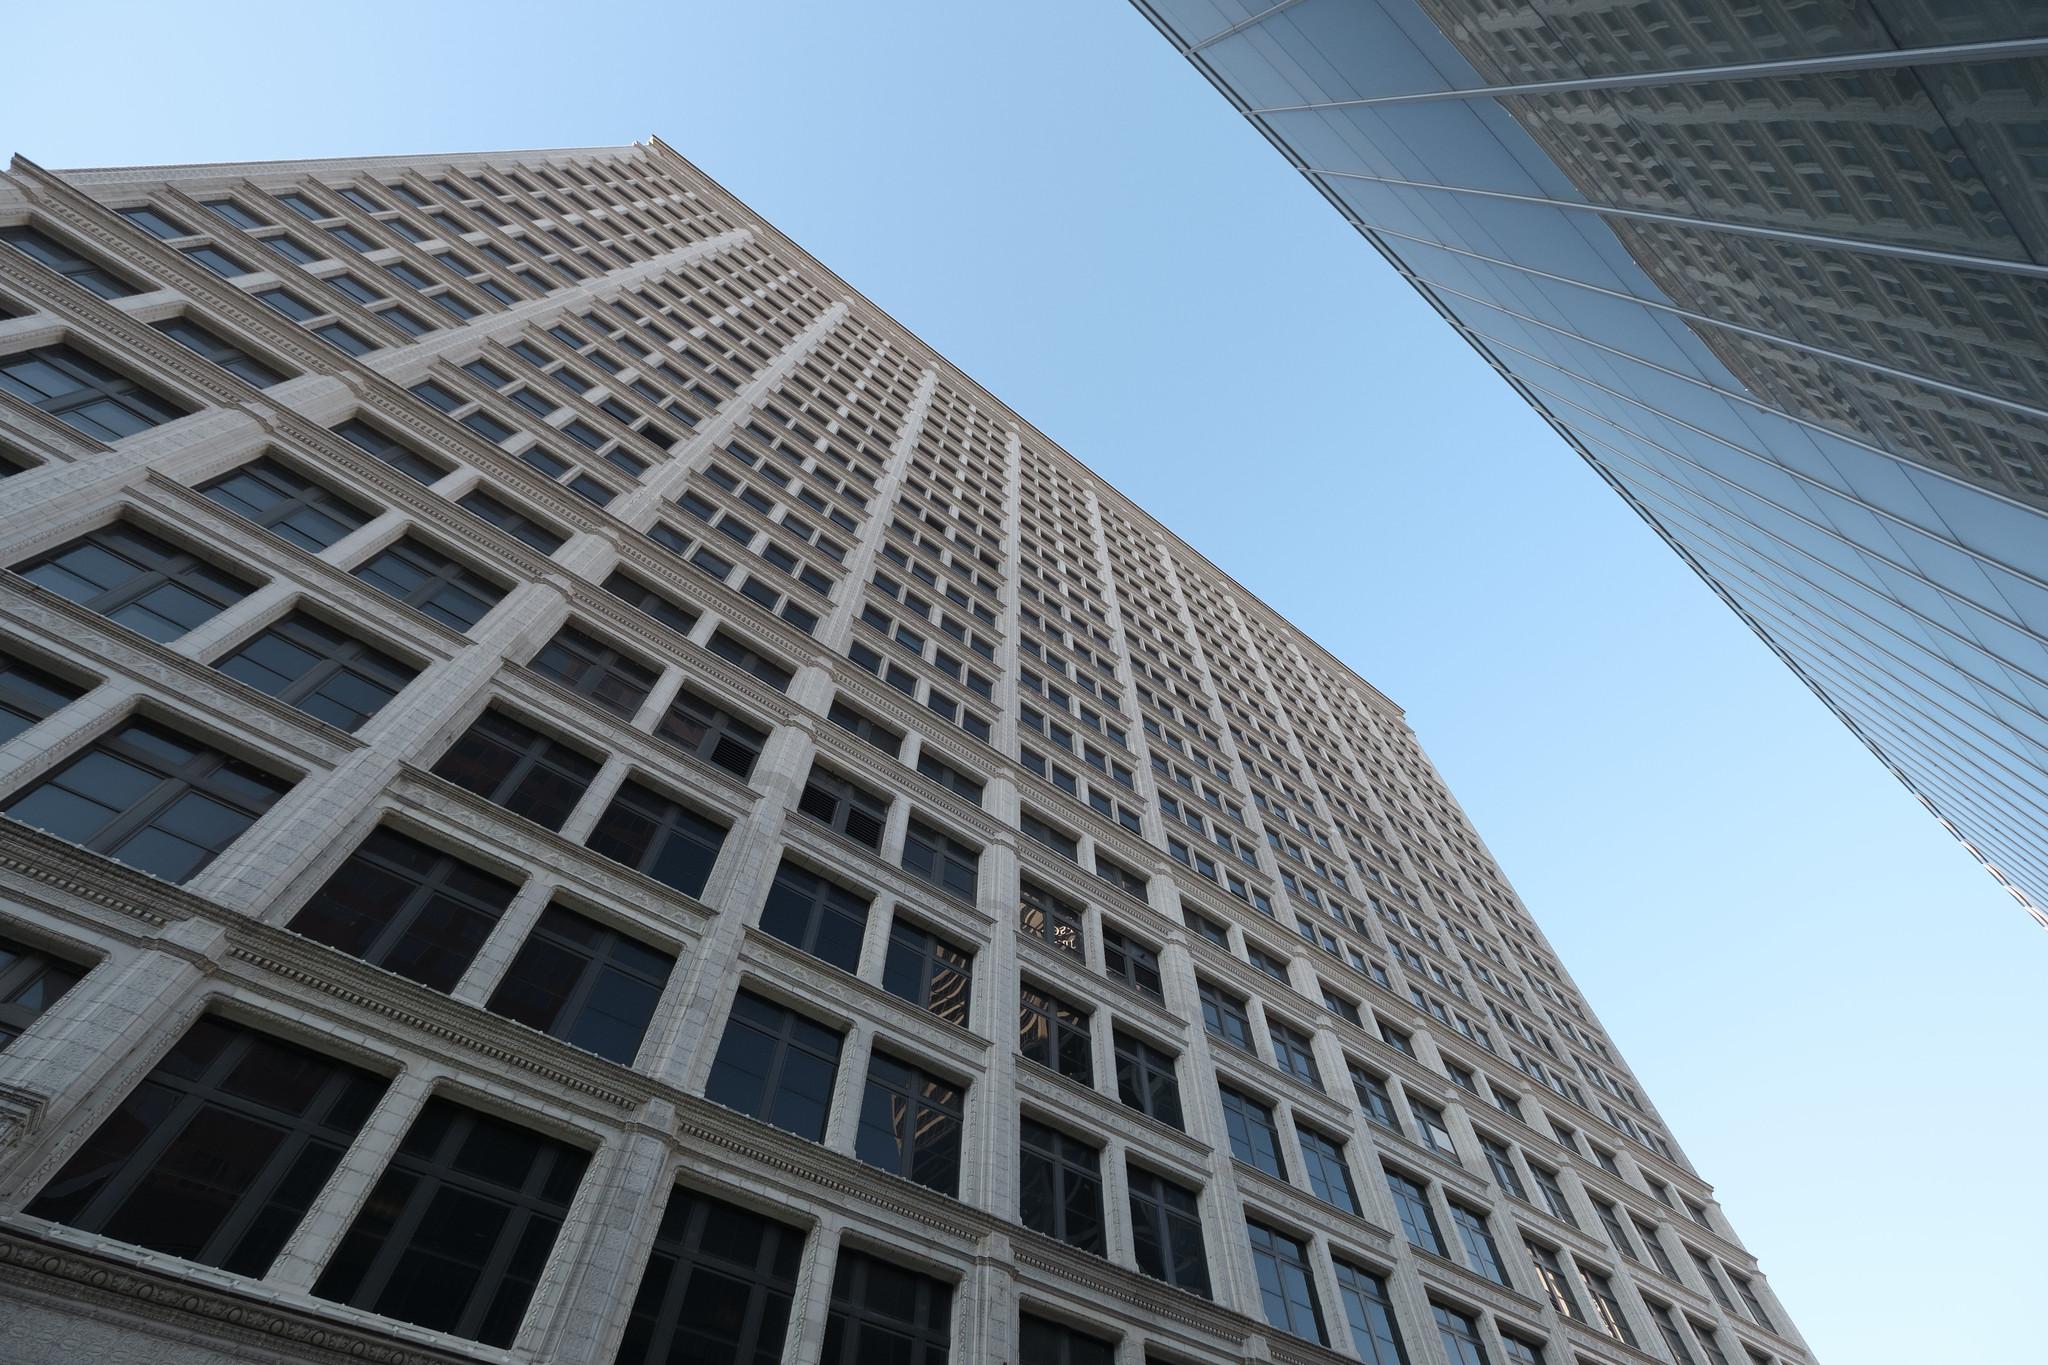 In Missouri, resource hubs aim to help building owners improve efficiency